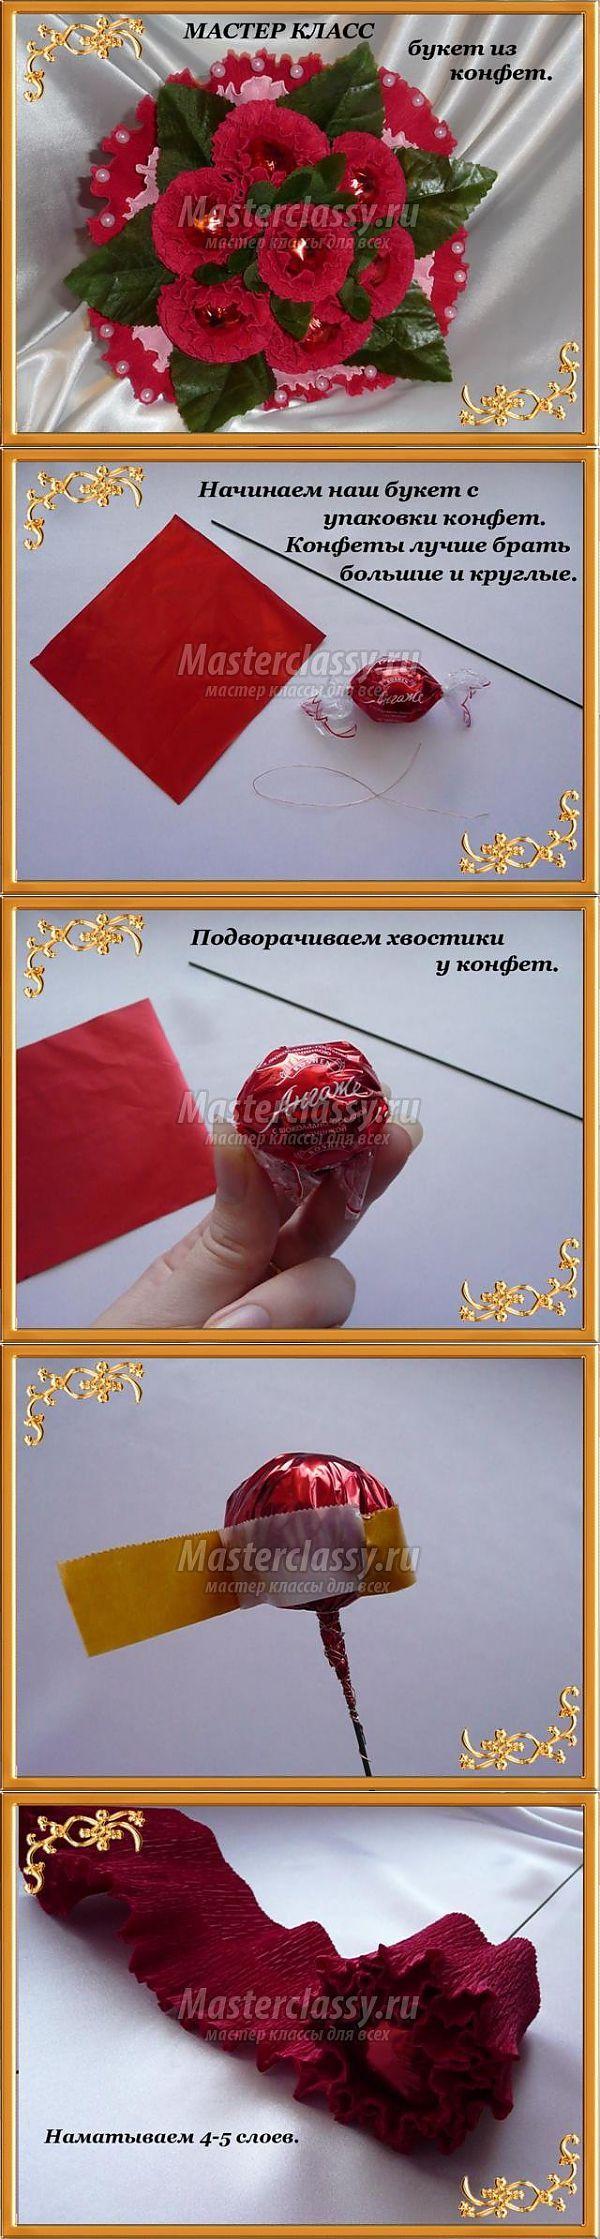 masterclassy.ru